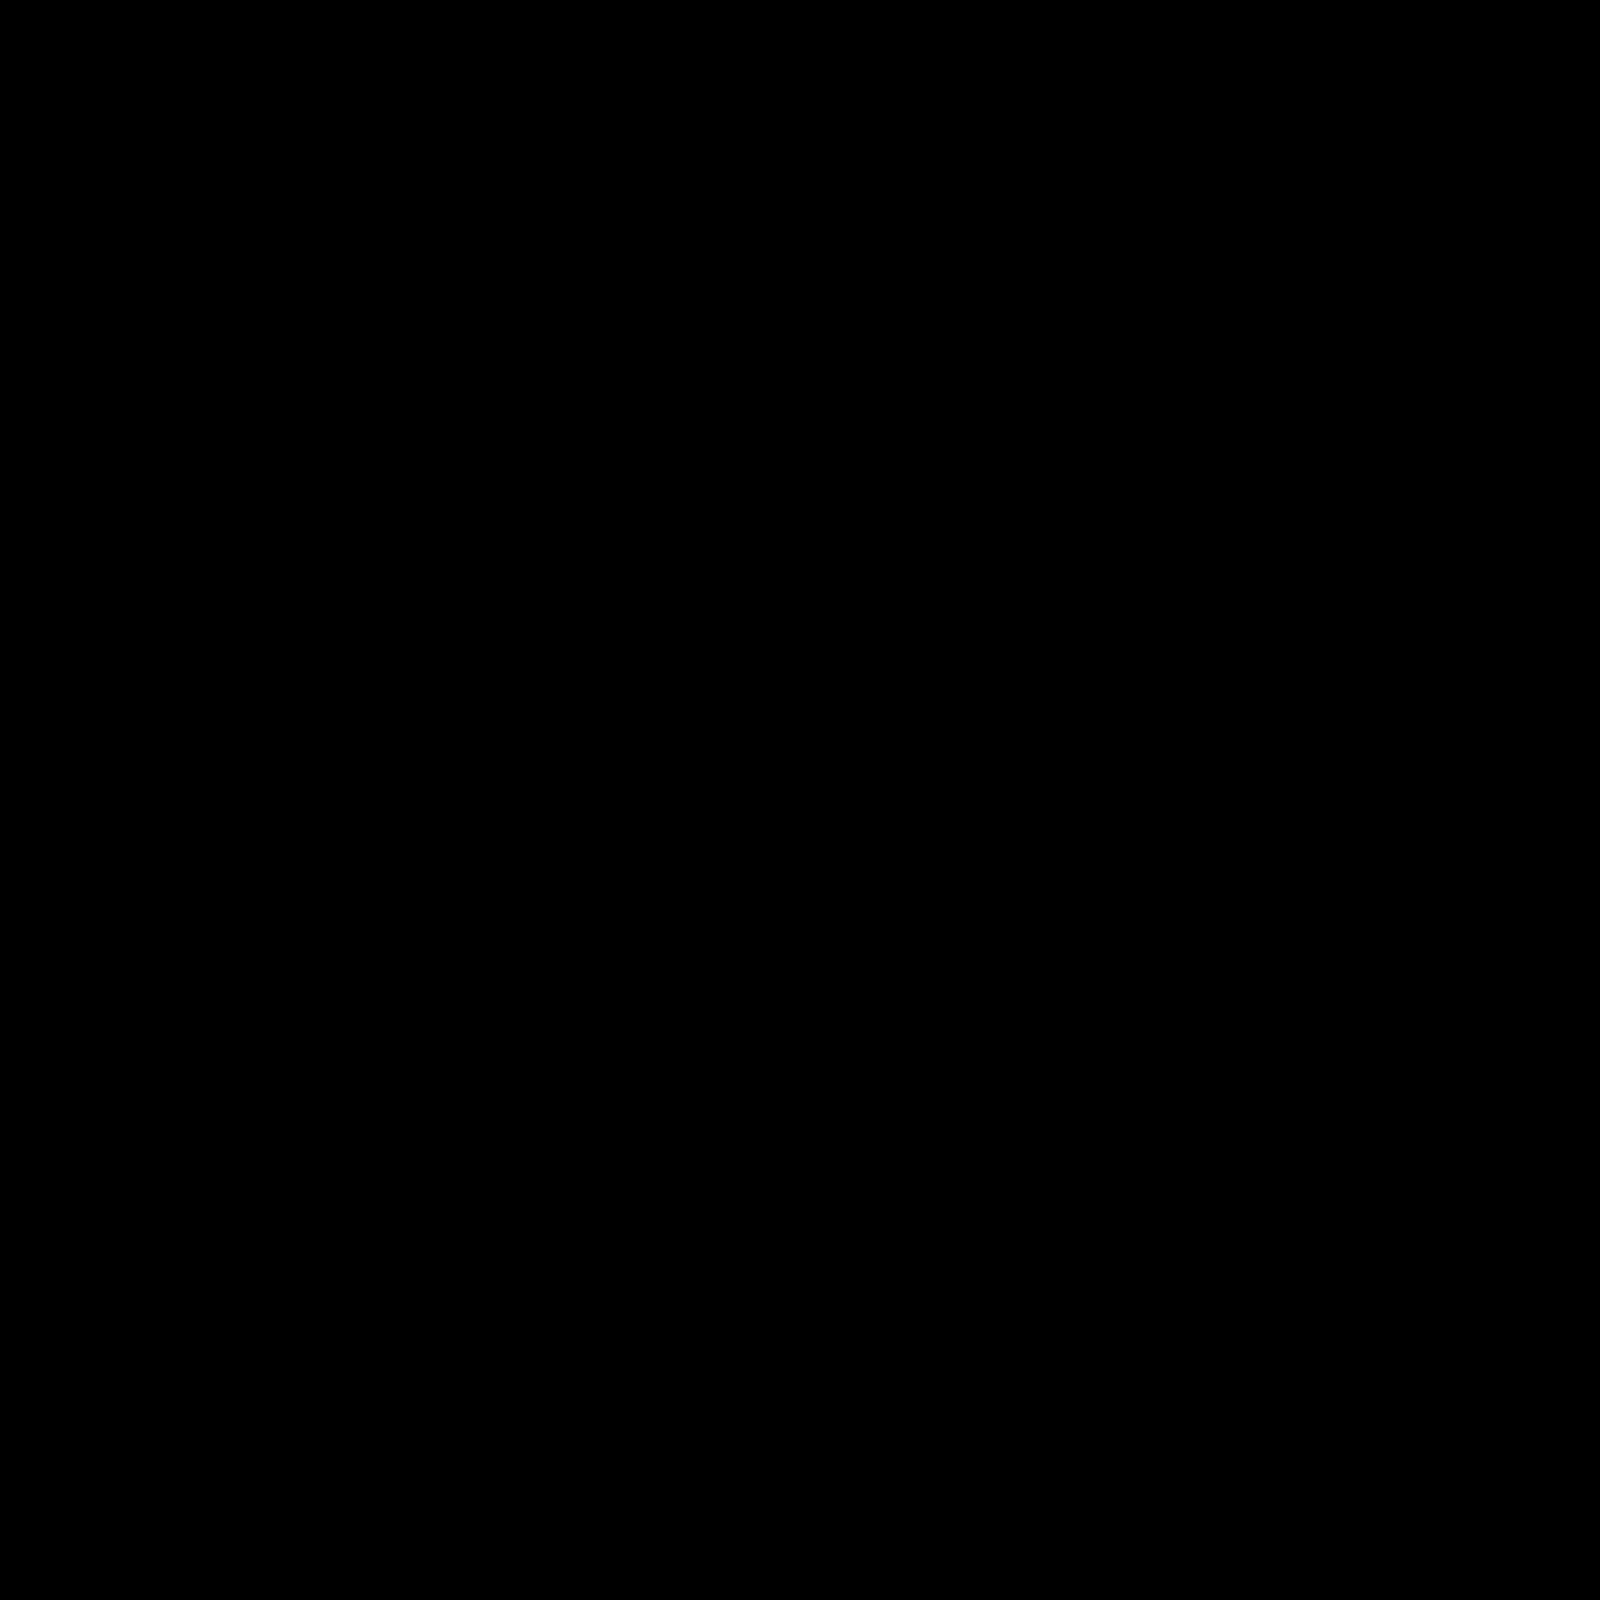 Follow icon